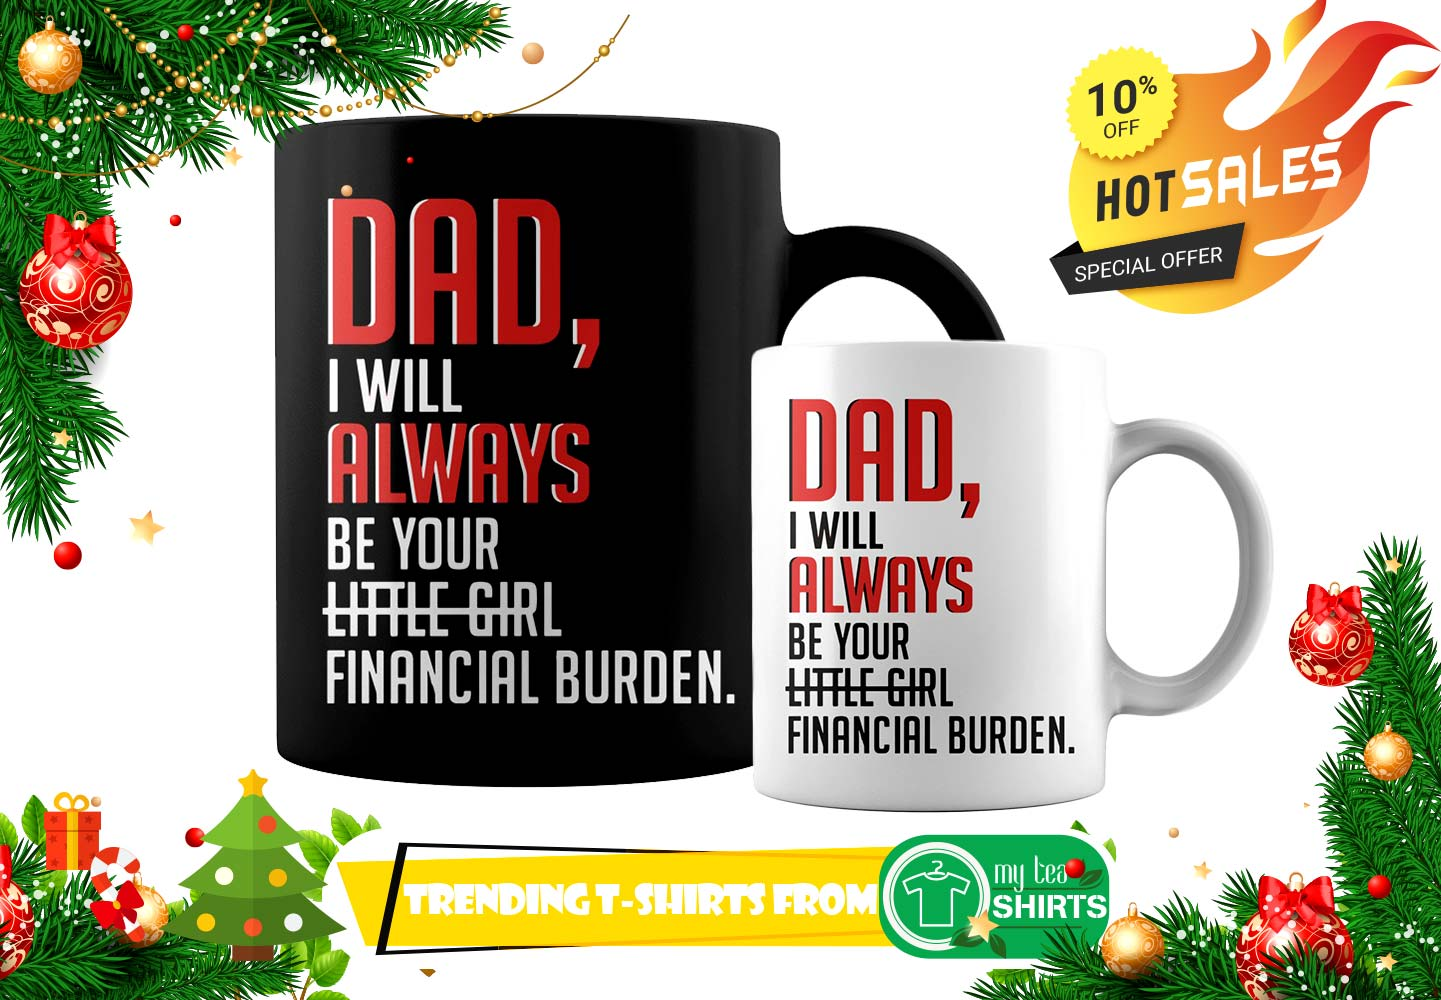 Dad i will always be your little girl financial burden mug banner